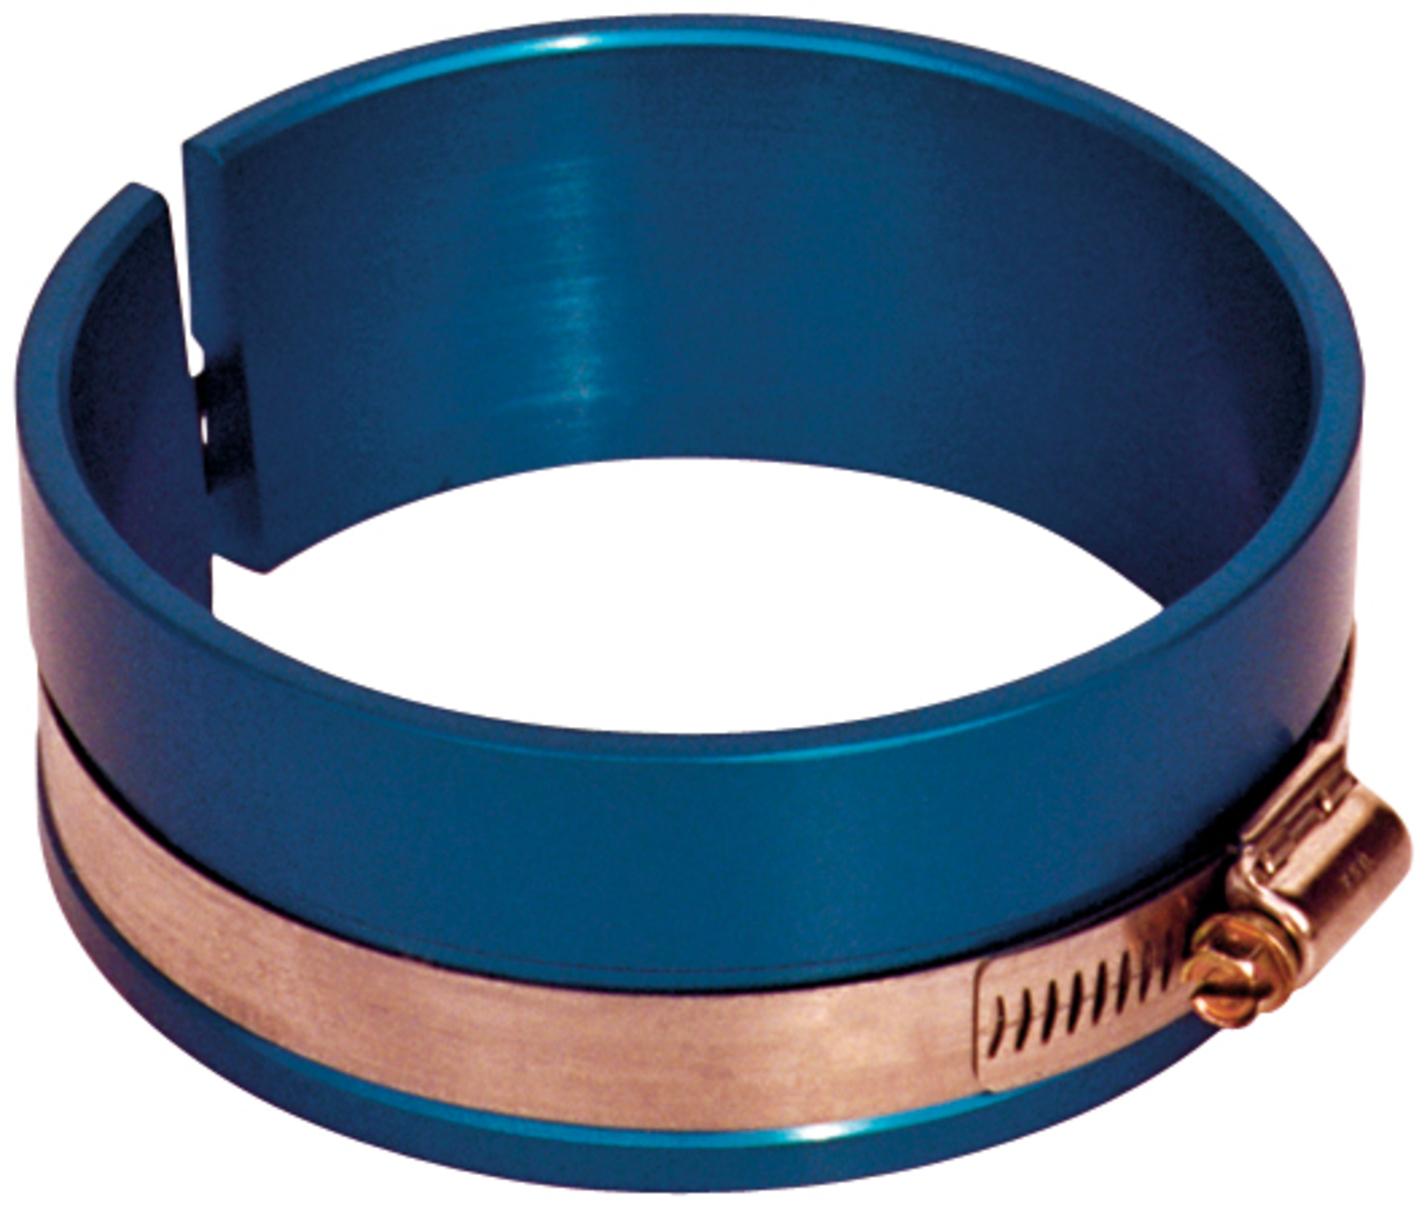 Proform Adjustable Piston Ring Compressor Tool Unit has a 4.000-4.090 Inch Bore Range Blue Anodized Aluminum Proform